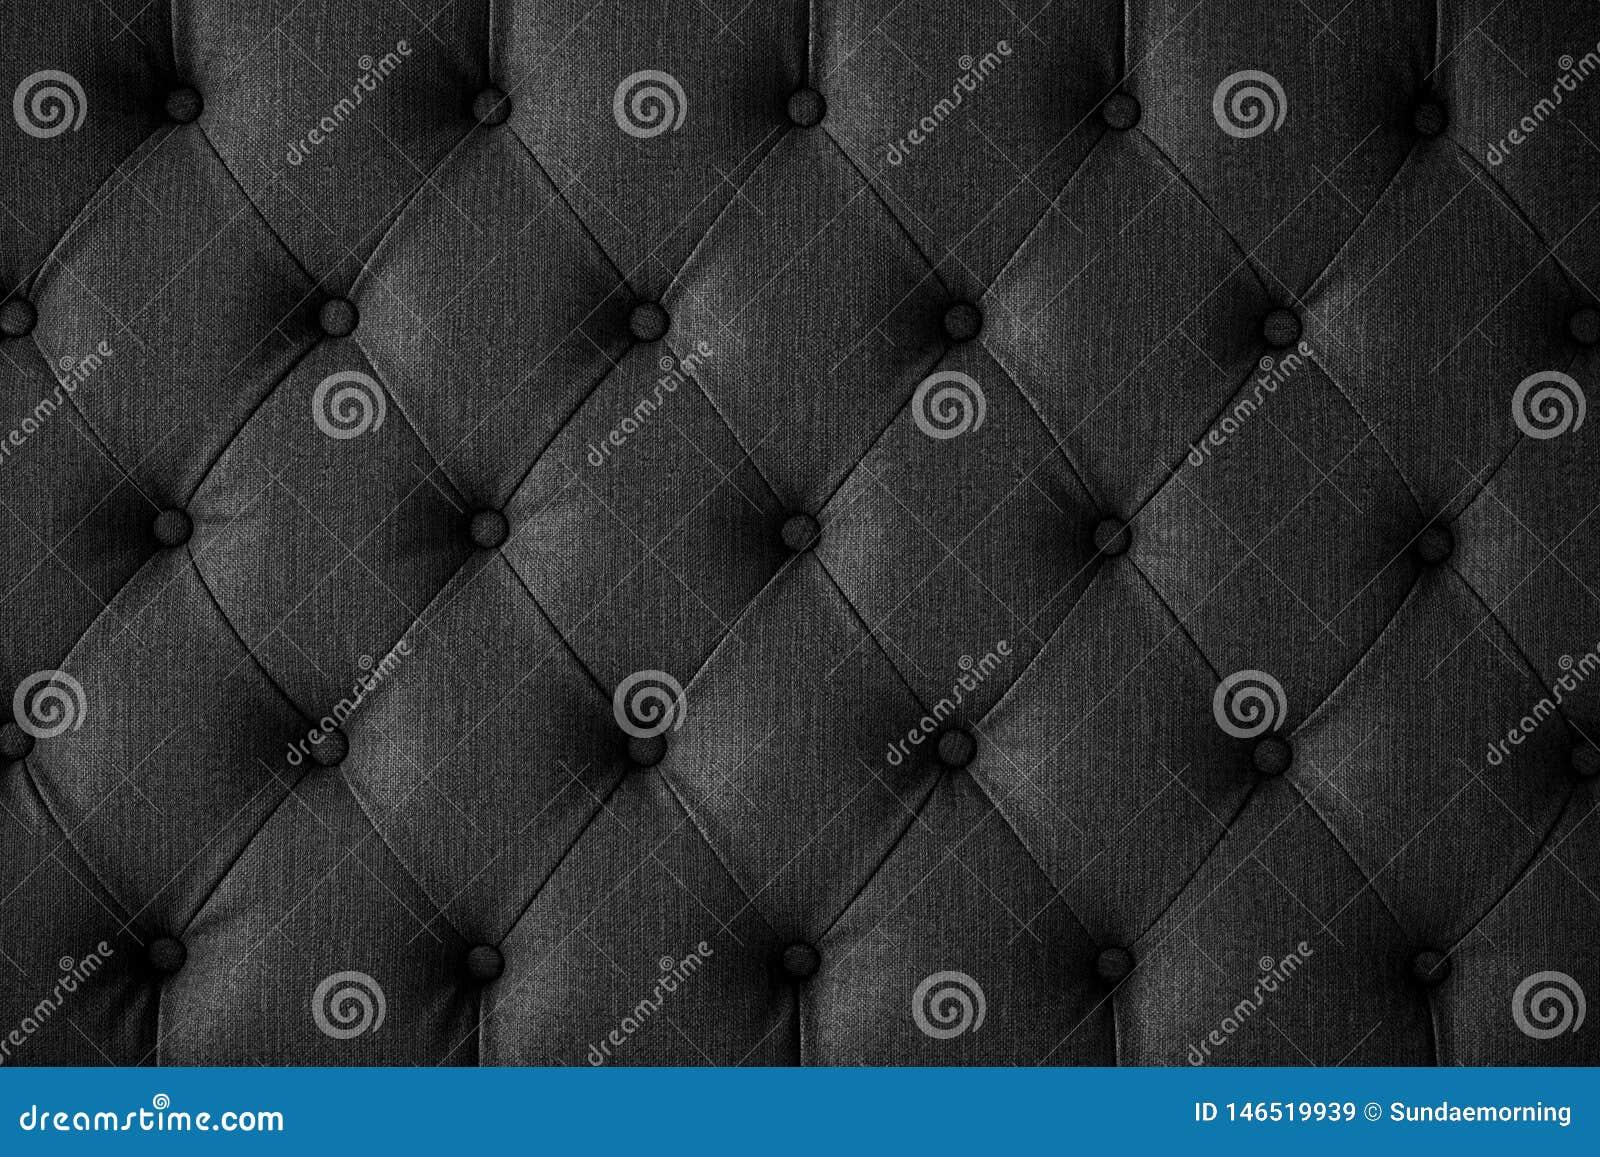 Strange Black And White Sofa Symmetry Texture Pattern Luxury Bralicious Painted Fabric Chair Ideas Braliciousco